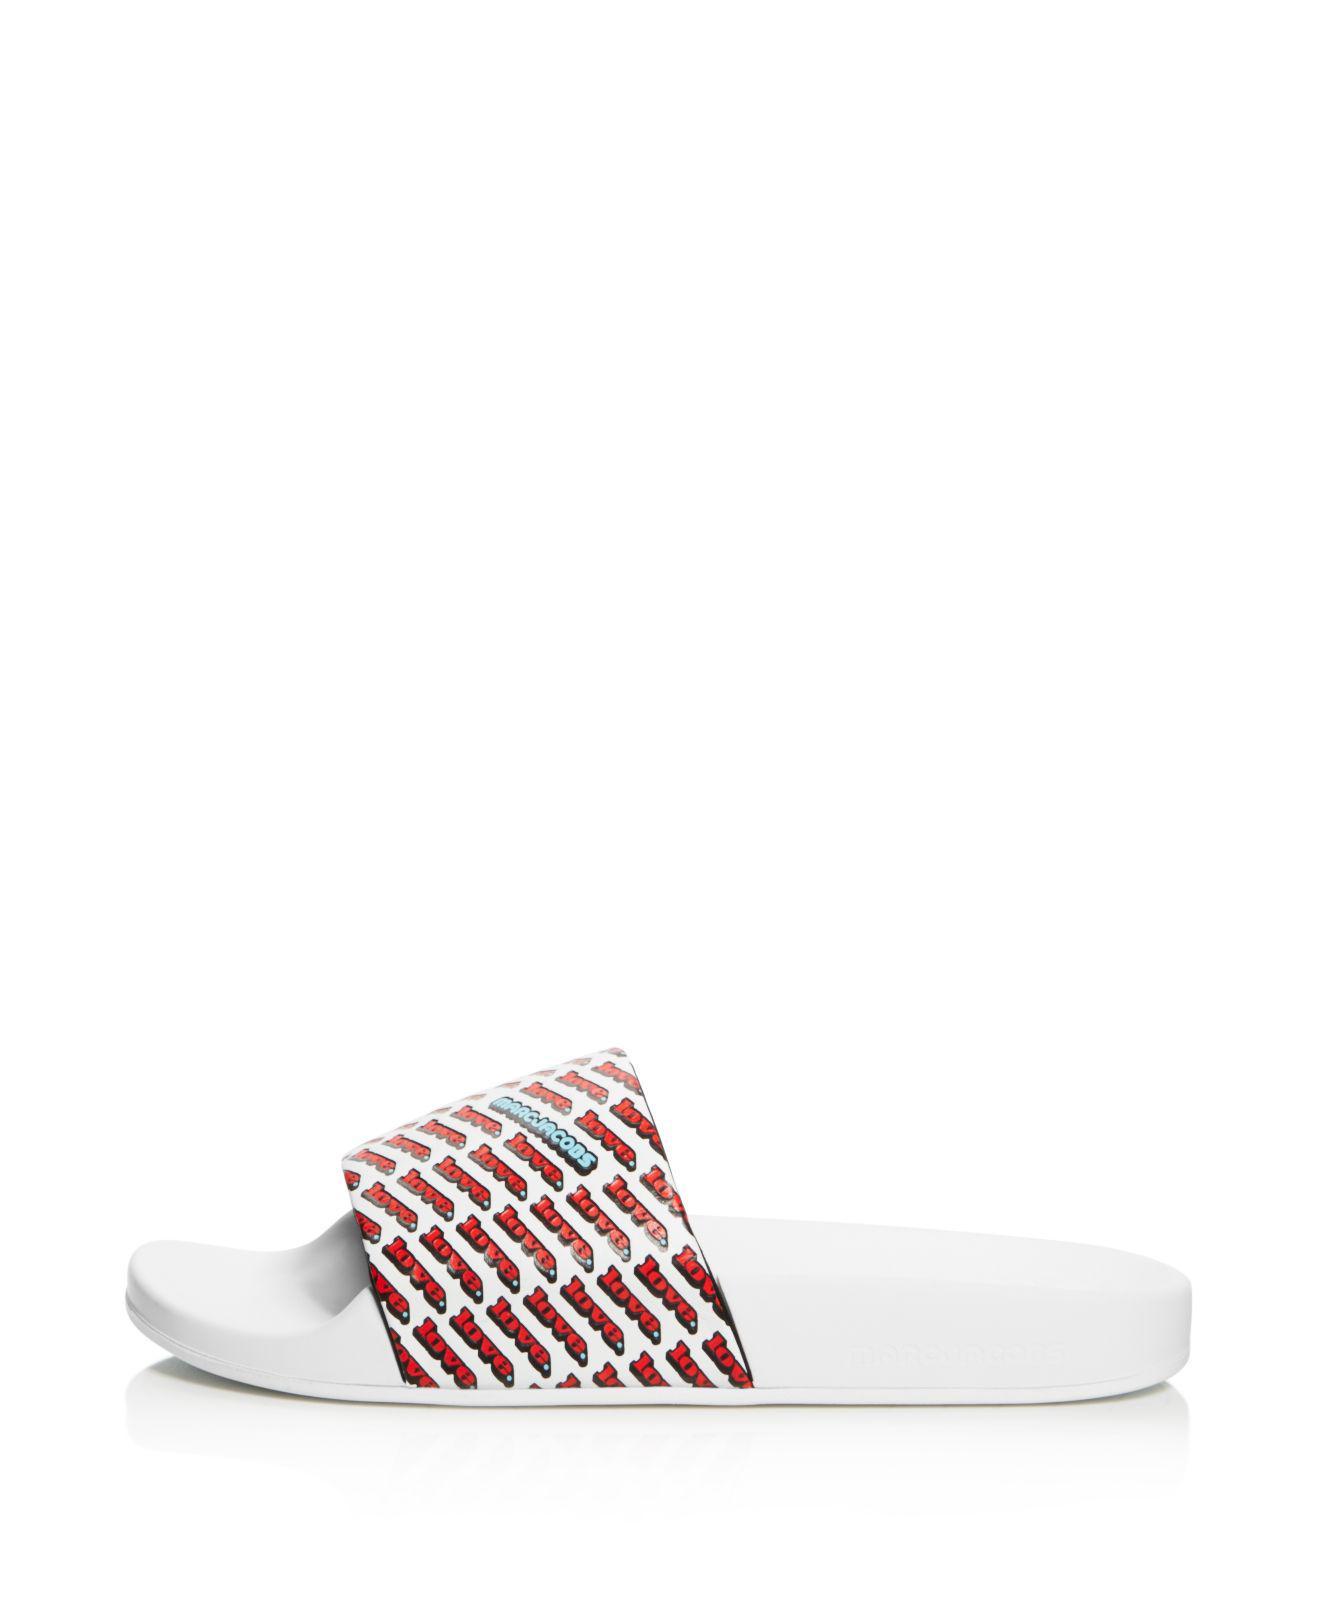 Marc Jacobs Women's Love Aqua Leather Slide Sandals WphFWG